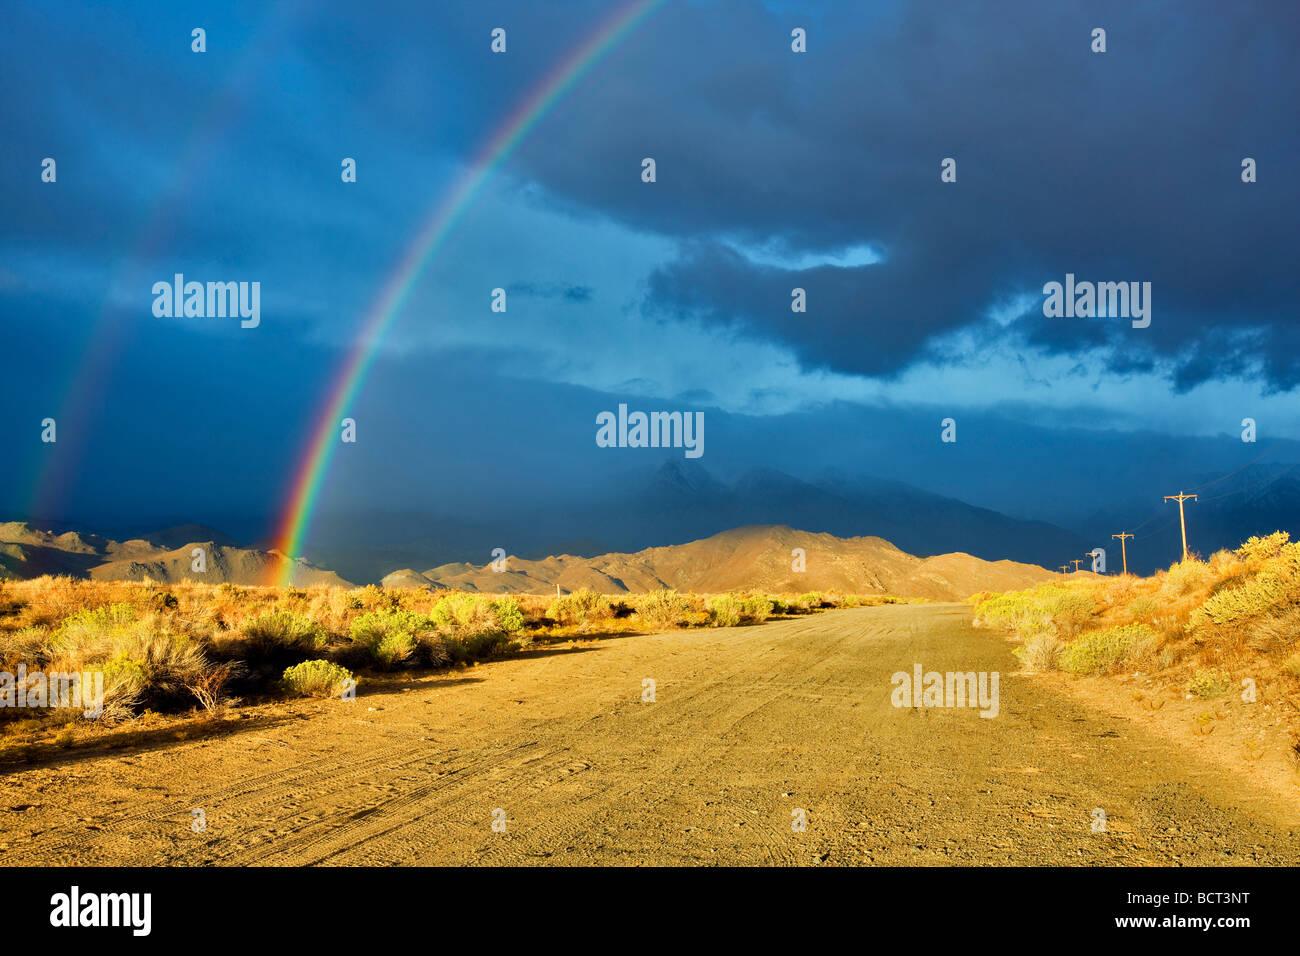 Rainbow over Eastern Sierra Mountains near Bishop California - Stock Image